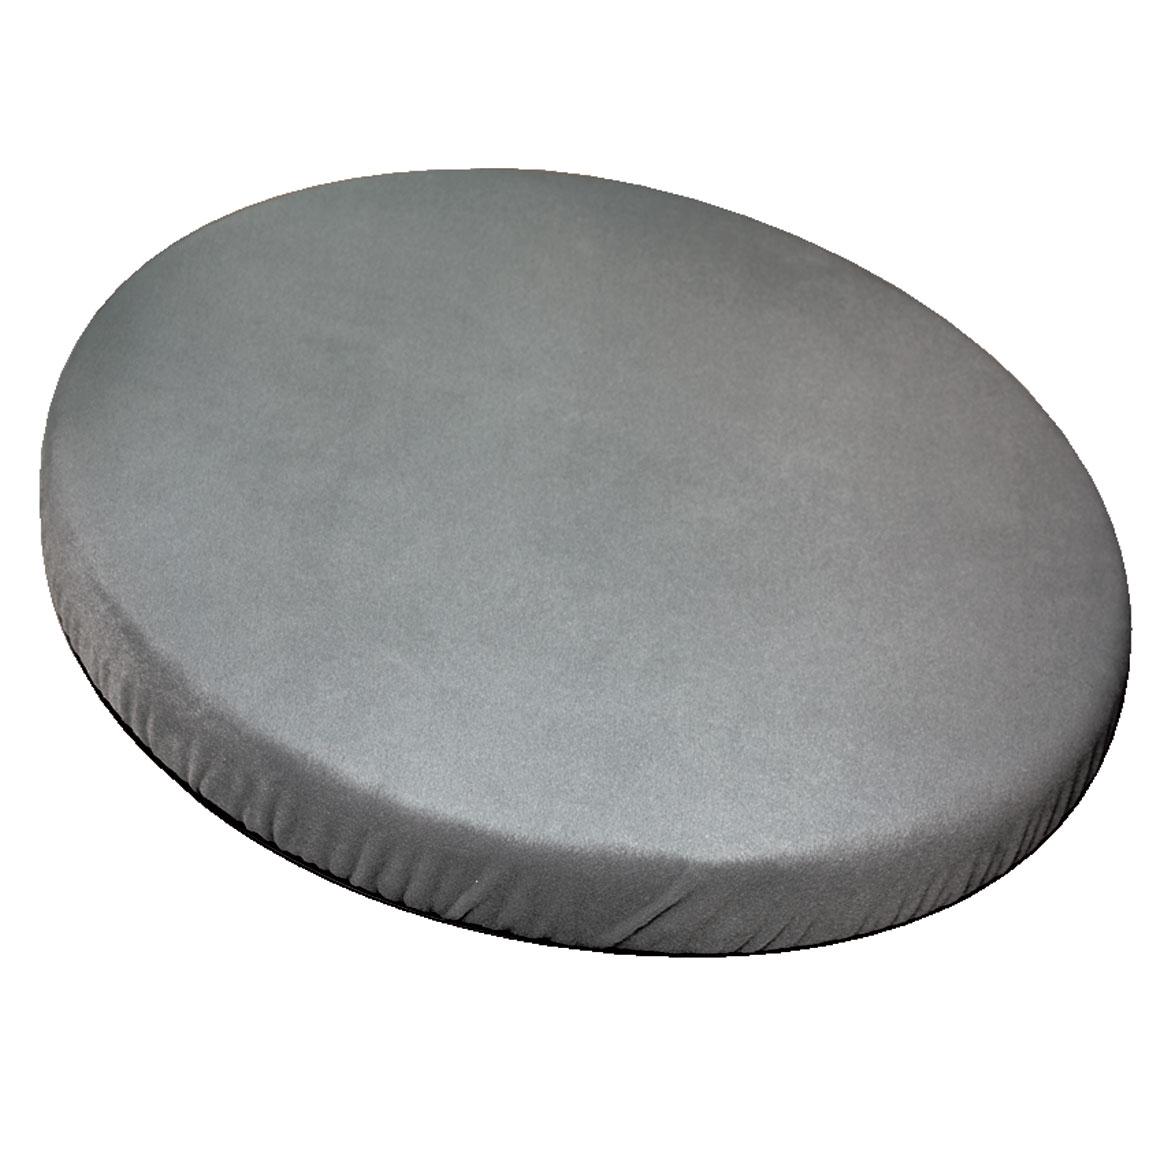 Swivel Seat Cushion-357553